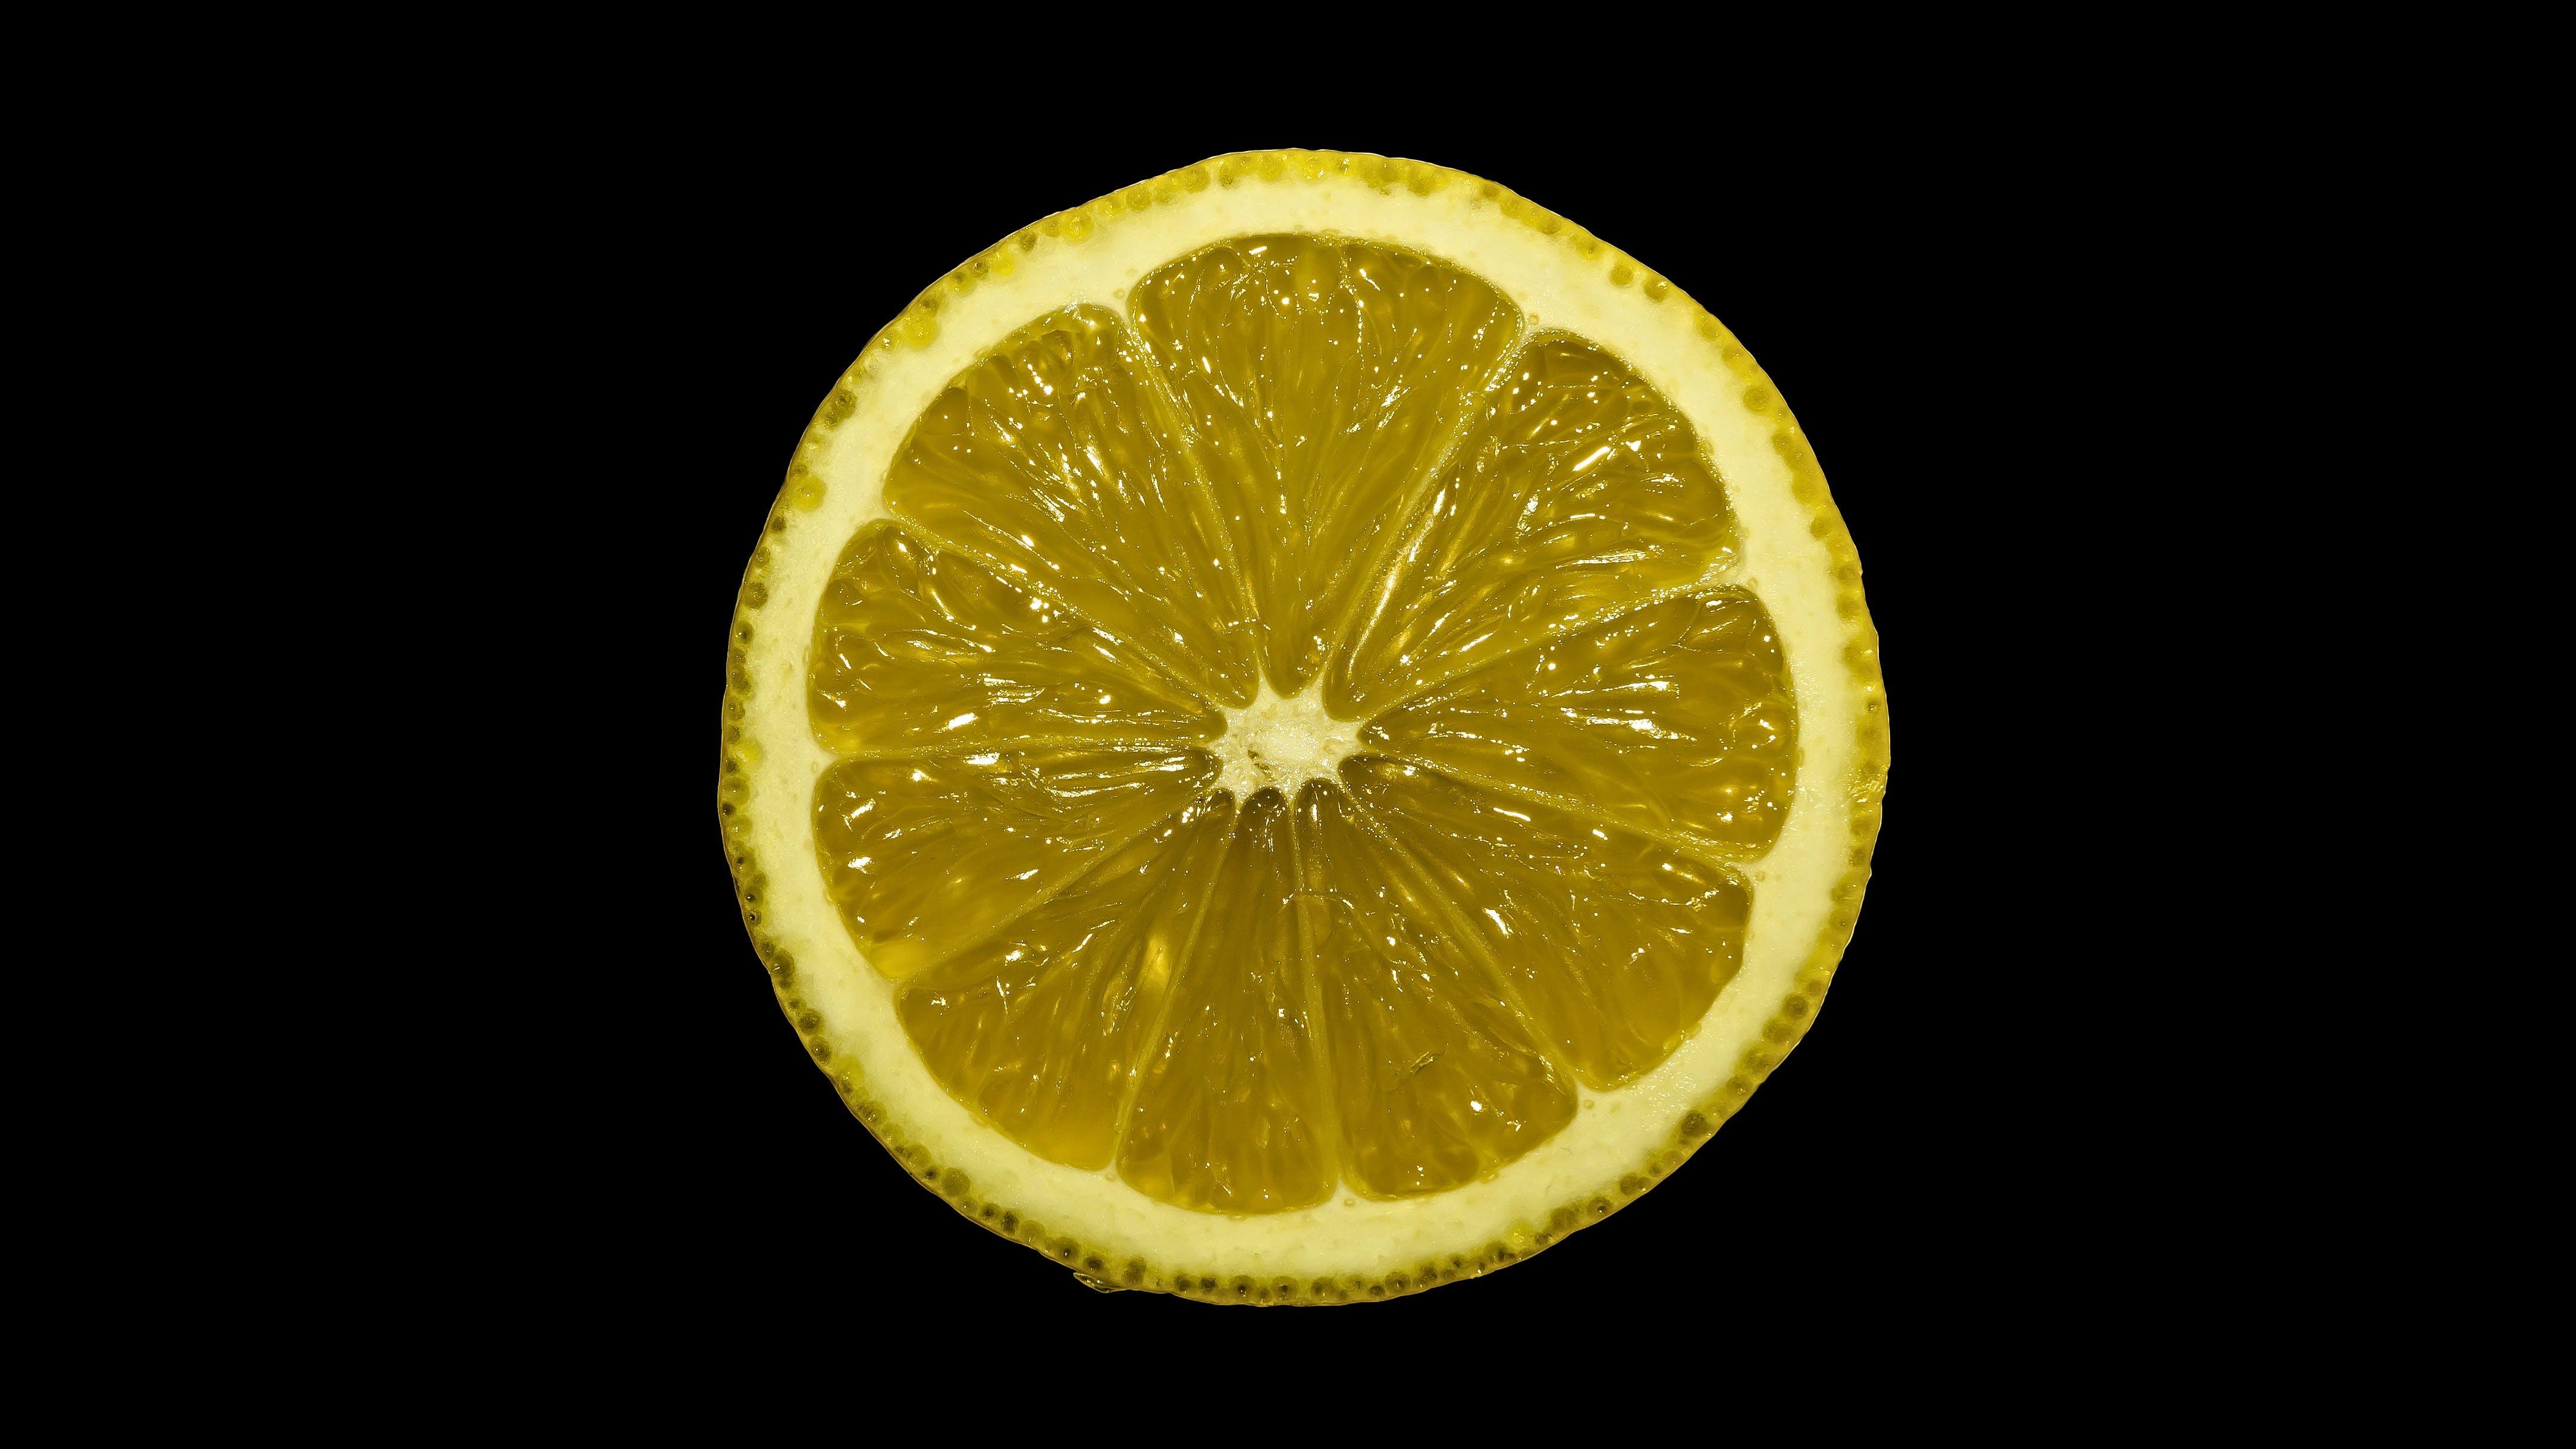 Free stock photo of citrus fruit, citrus fruits, fruit, fruity